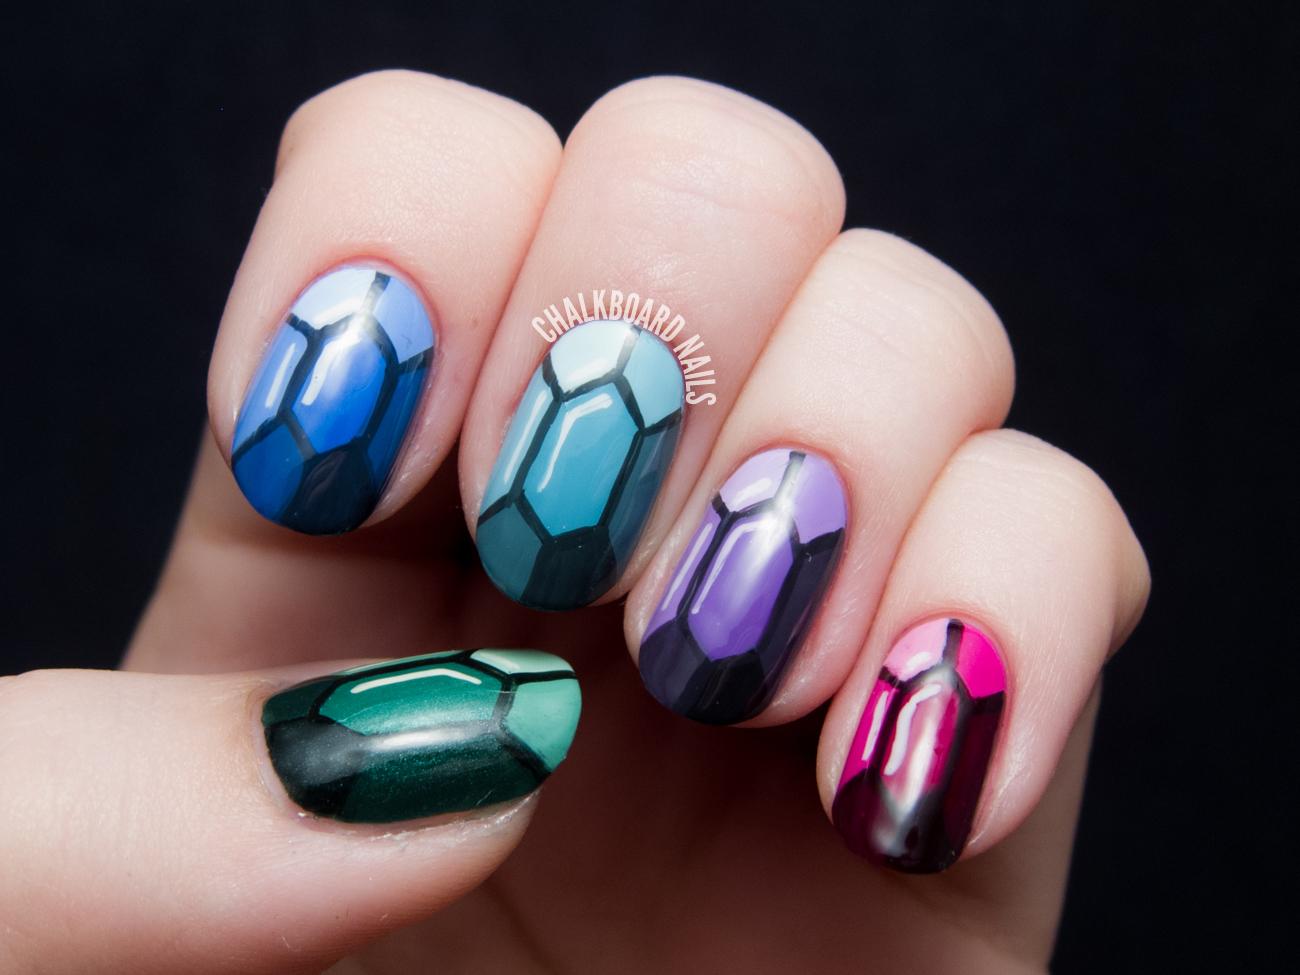 Nail Art: TUTORIAL: Precious Gems Nail Art Inspired By The Ring And